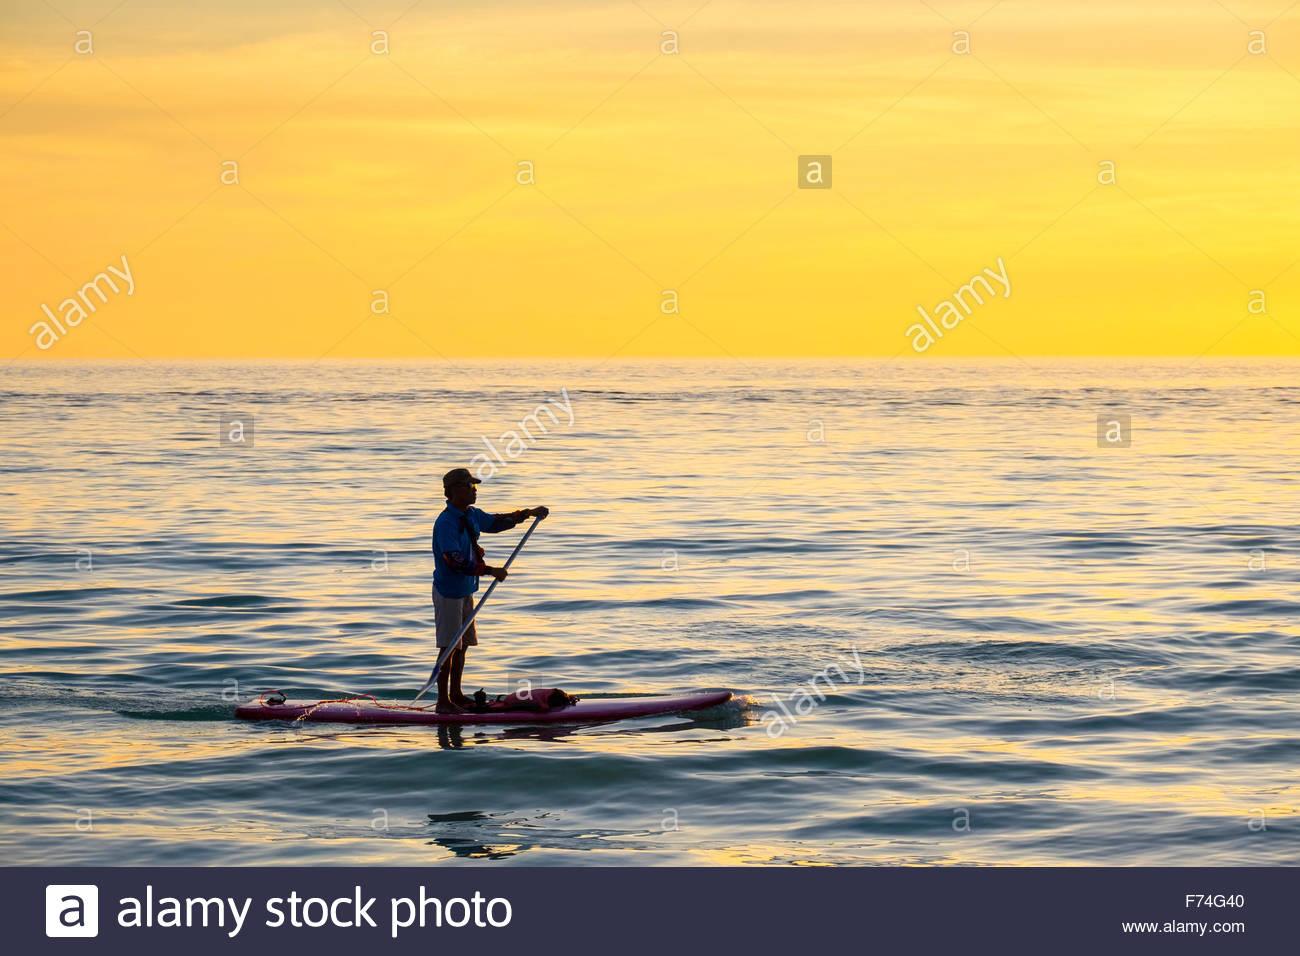 Un uomo su uno stand-up-paddleboard (SUP) al tramonto, Boracay Island, Aklan Provincia, Western Visayas, Filippine Immagini Stock